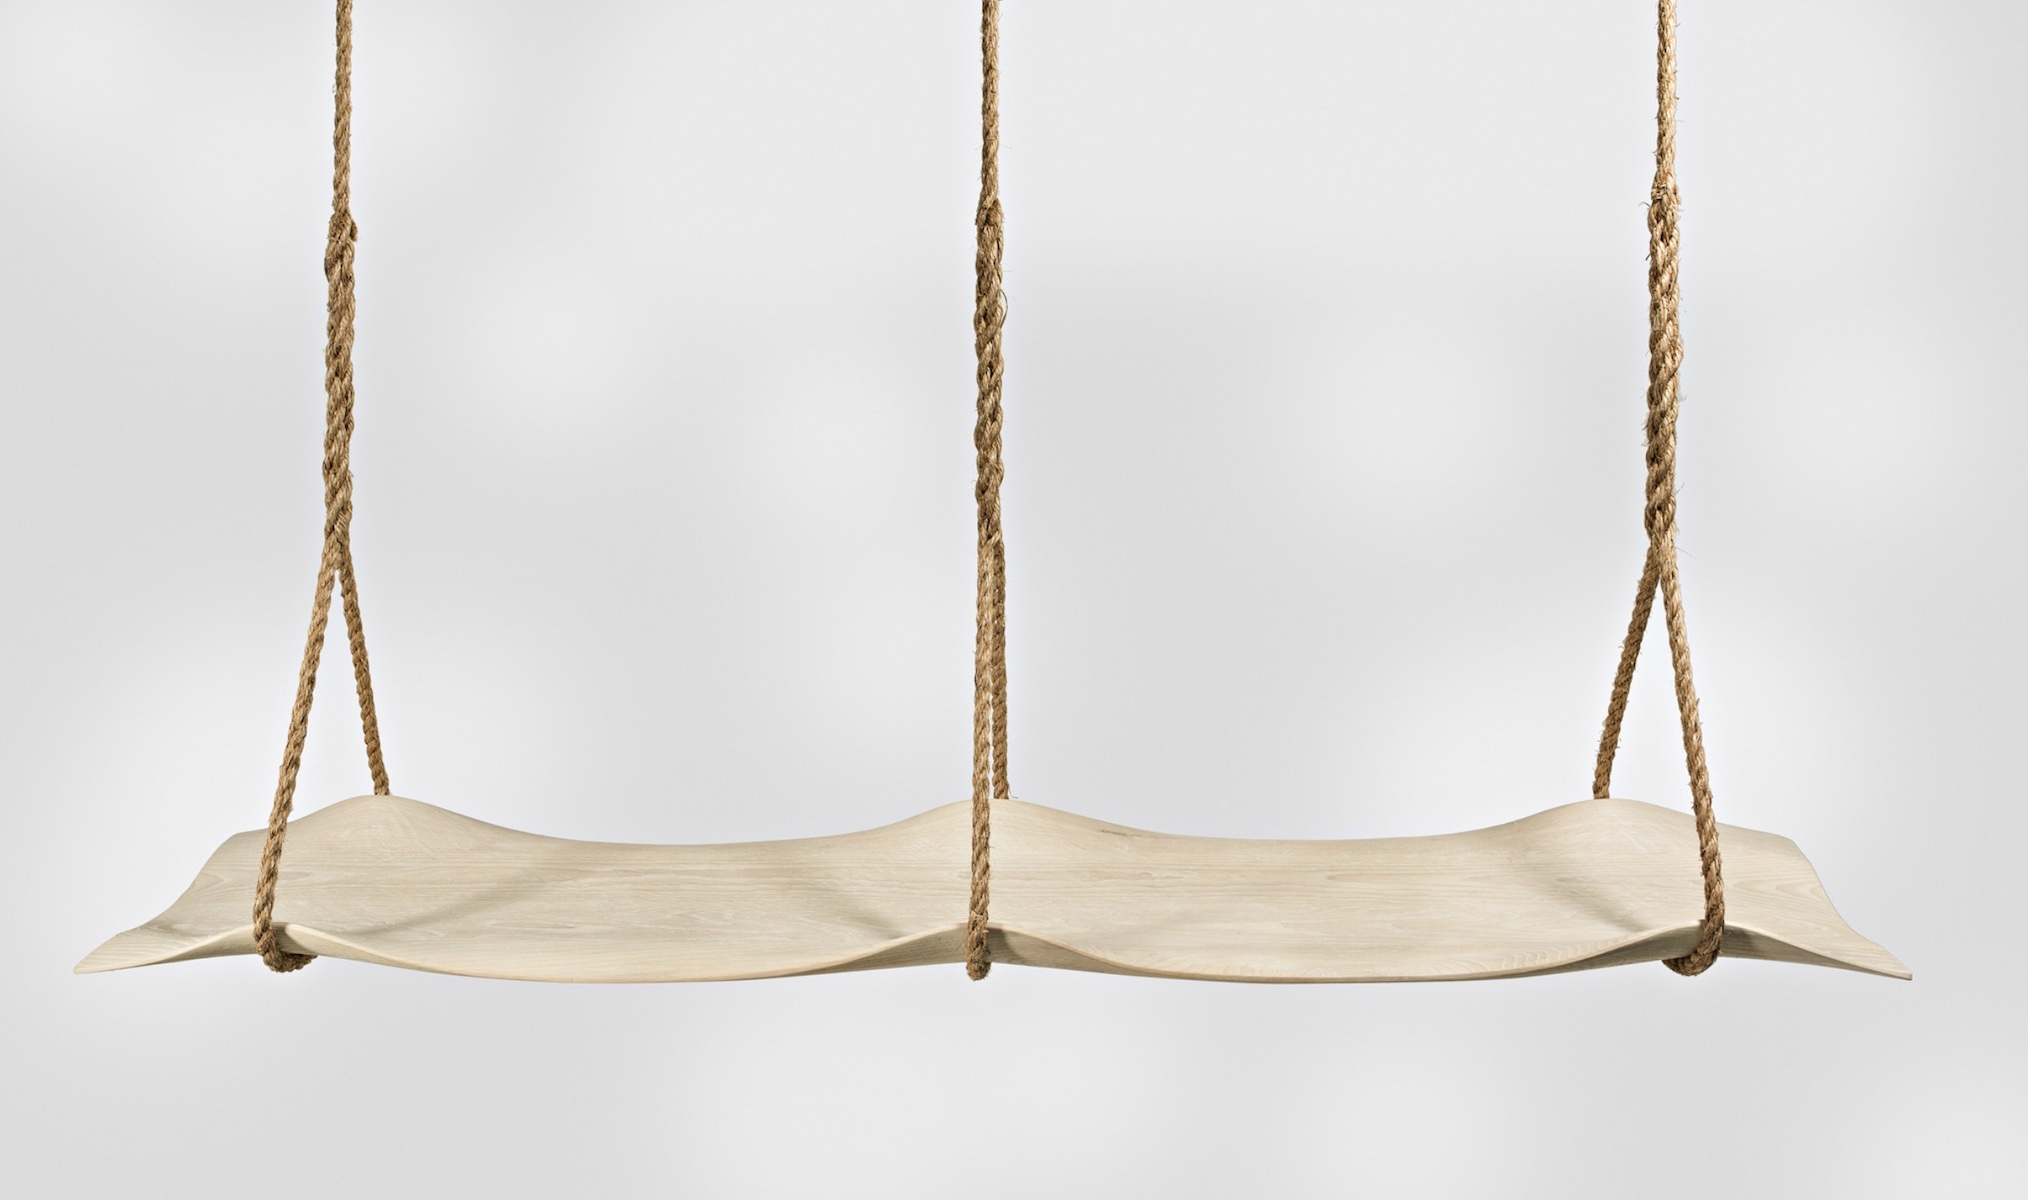 double Swing Seat by artist Christopher Kurtz